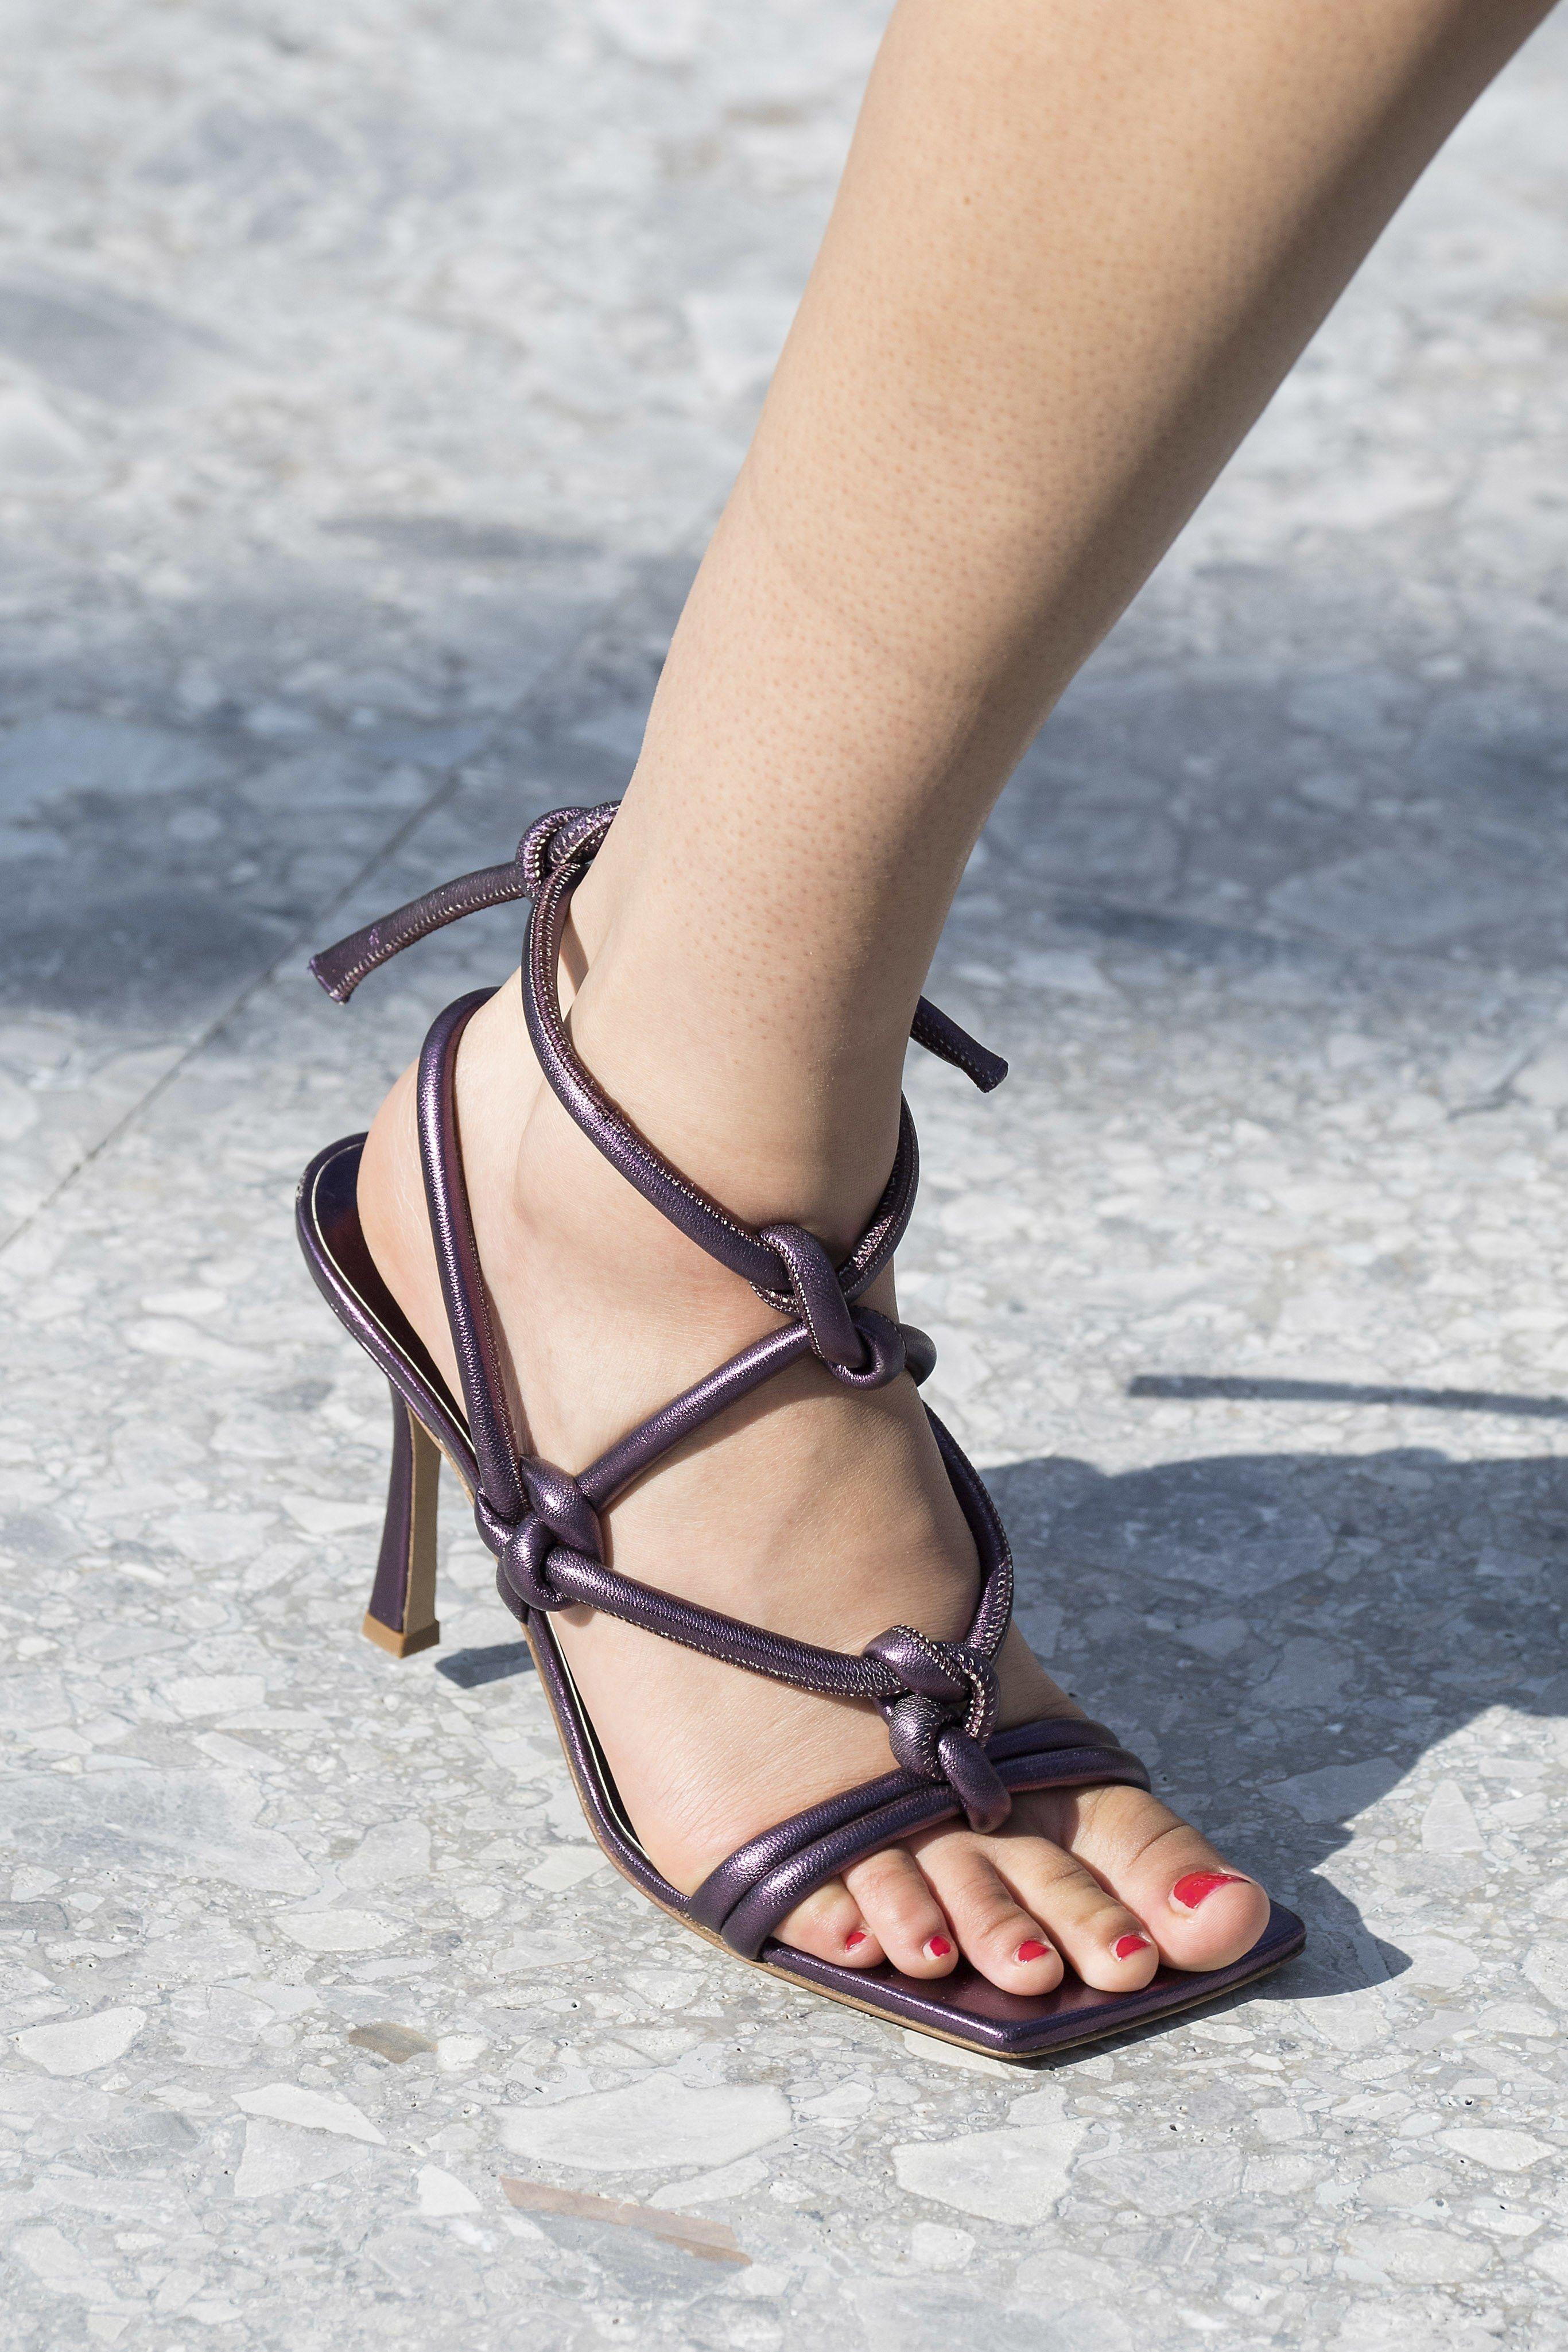 bottega veneta shoes 2019